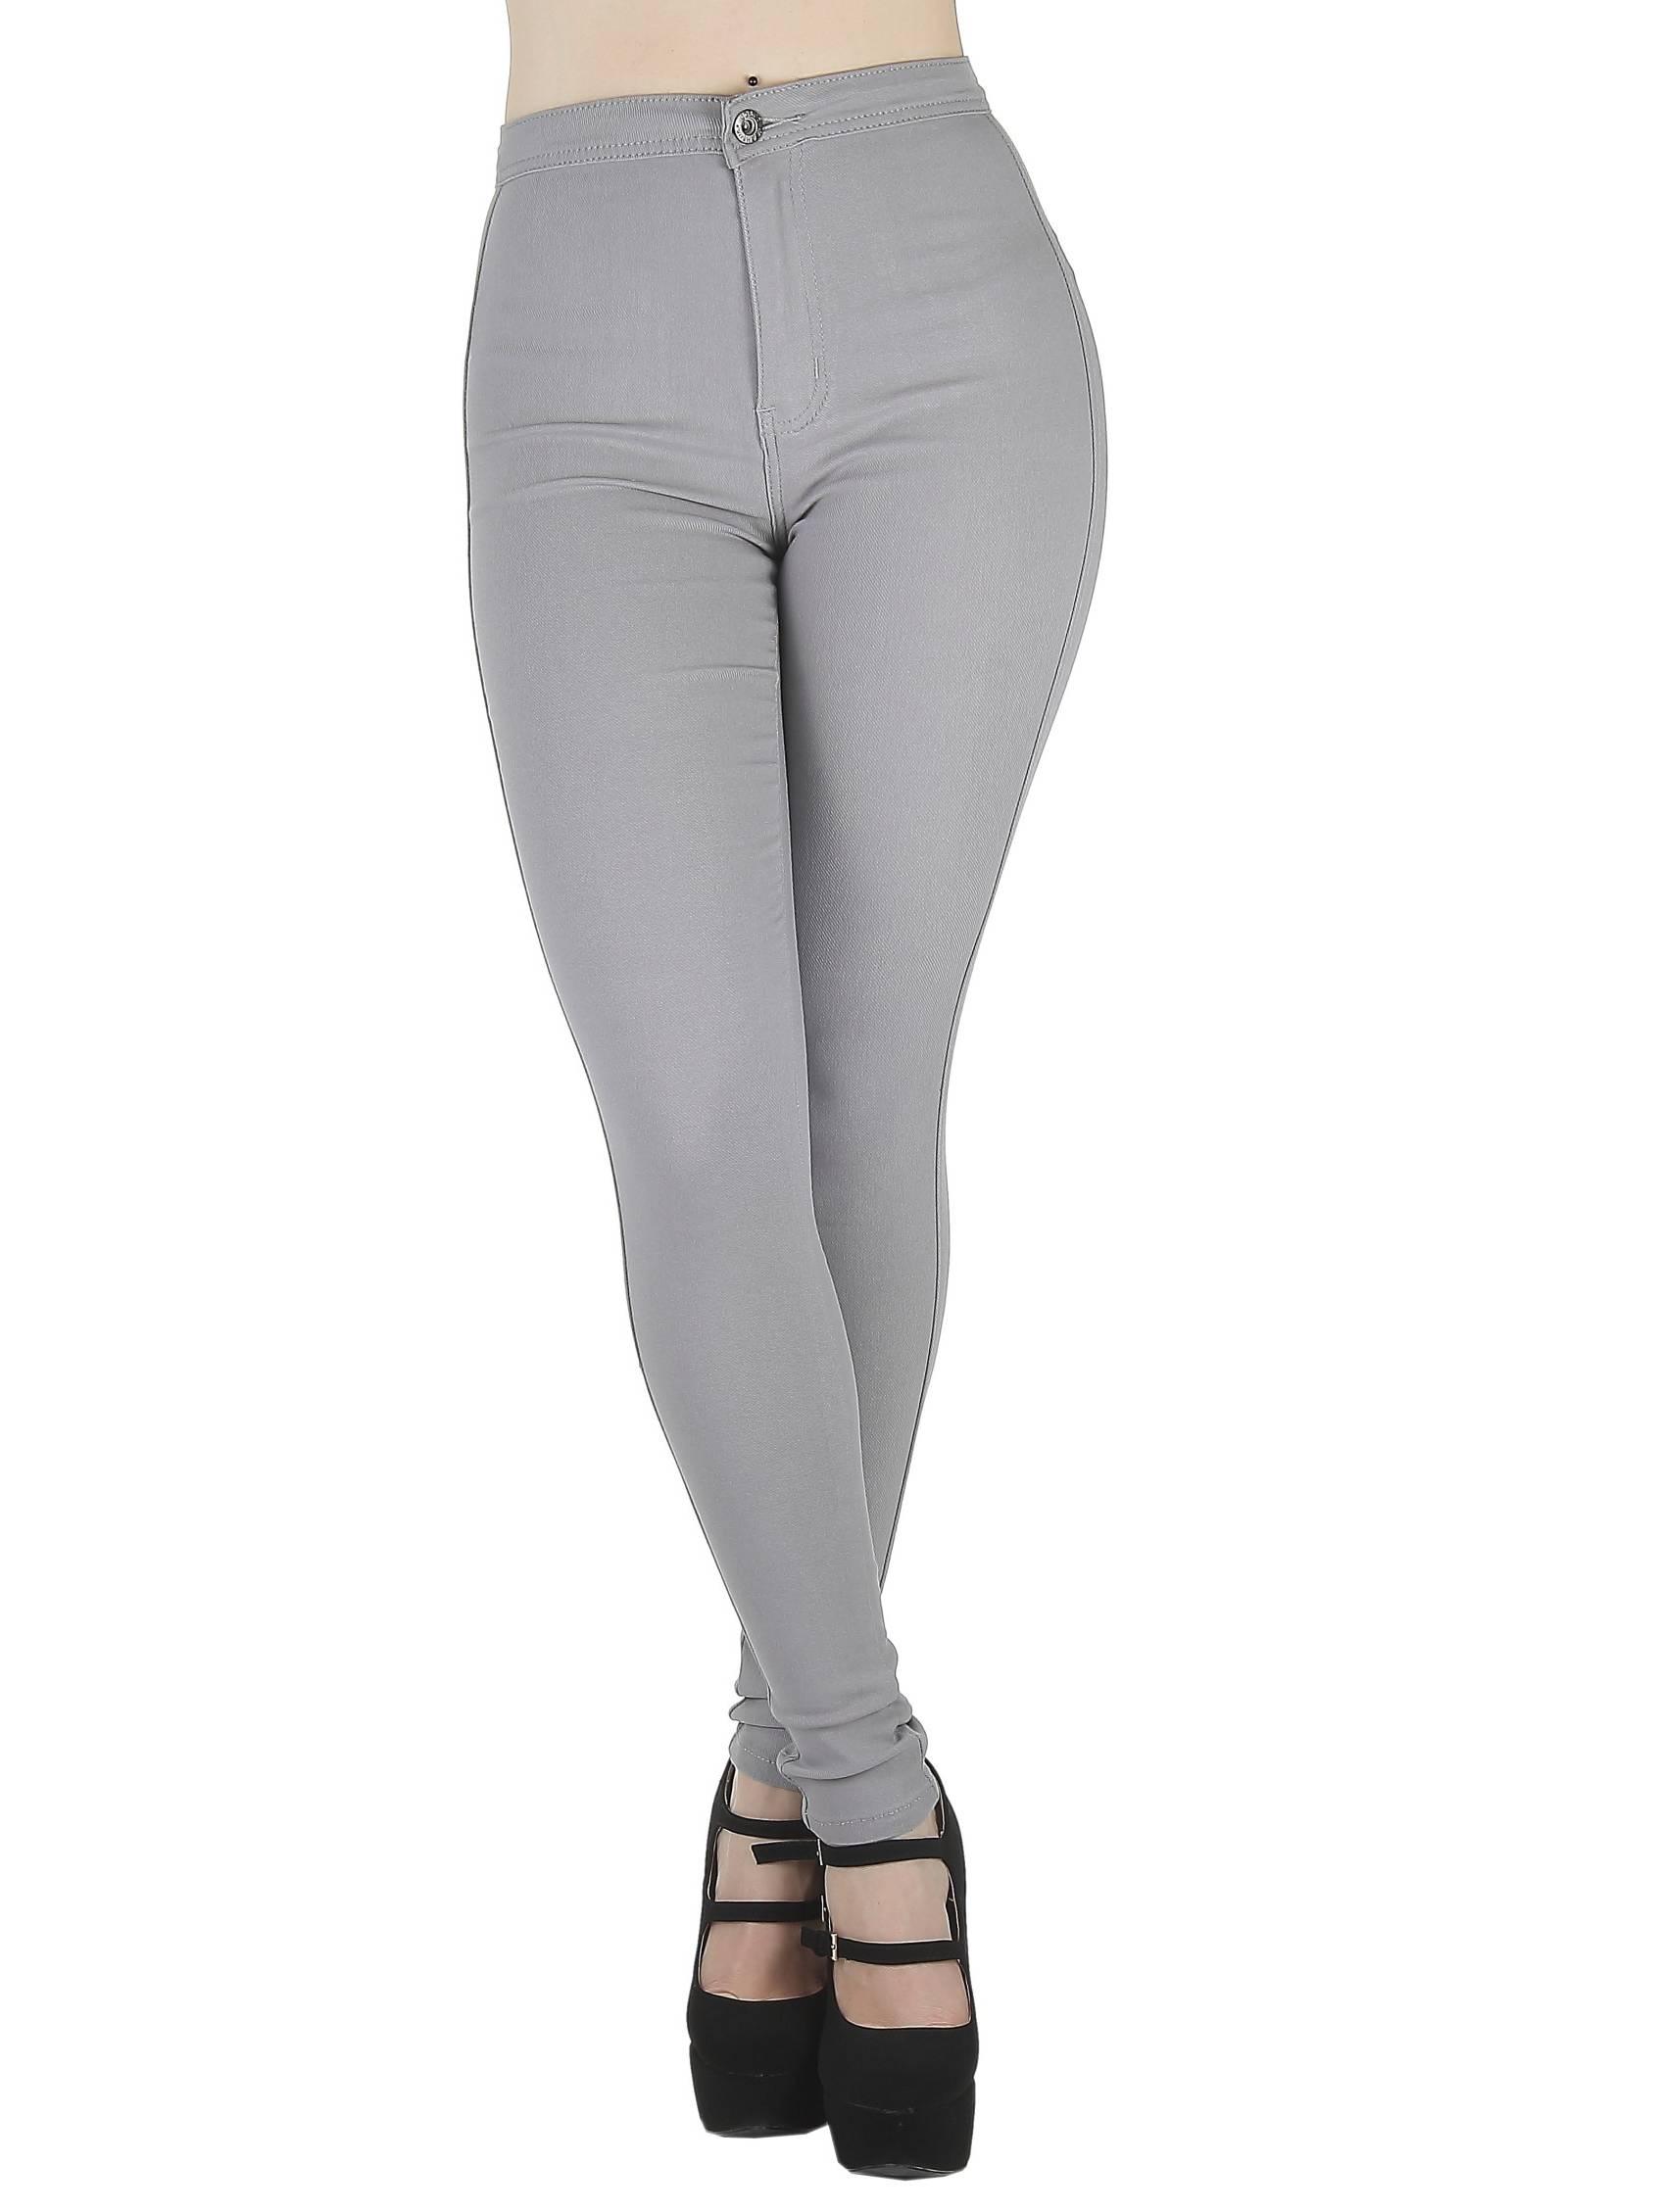 GP2100 - High Waist, Super Stretch, Sexy, Side Cut Design, Skinny Color Jeans